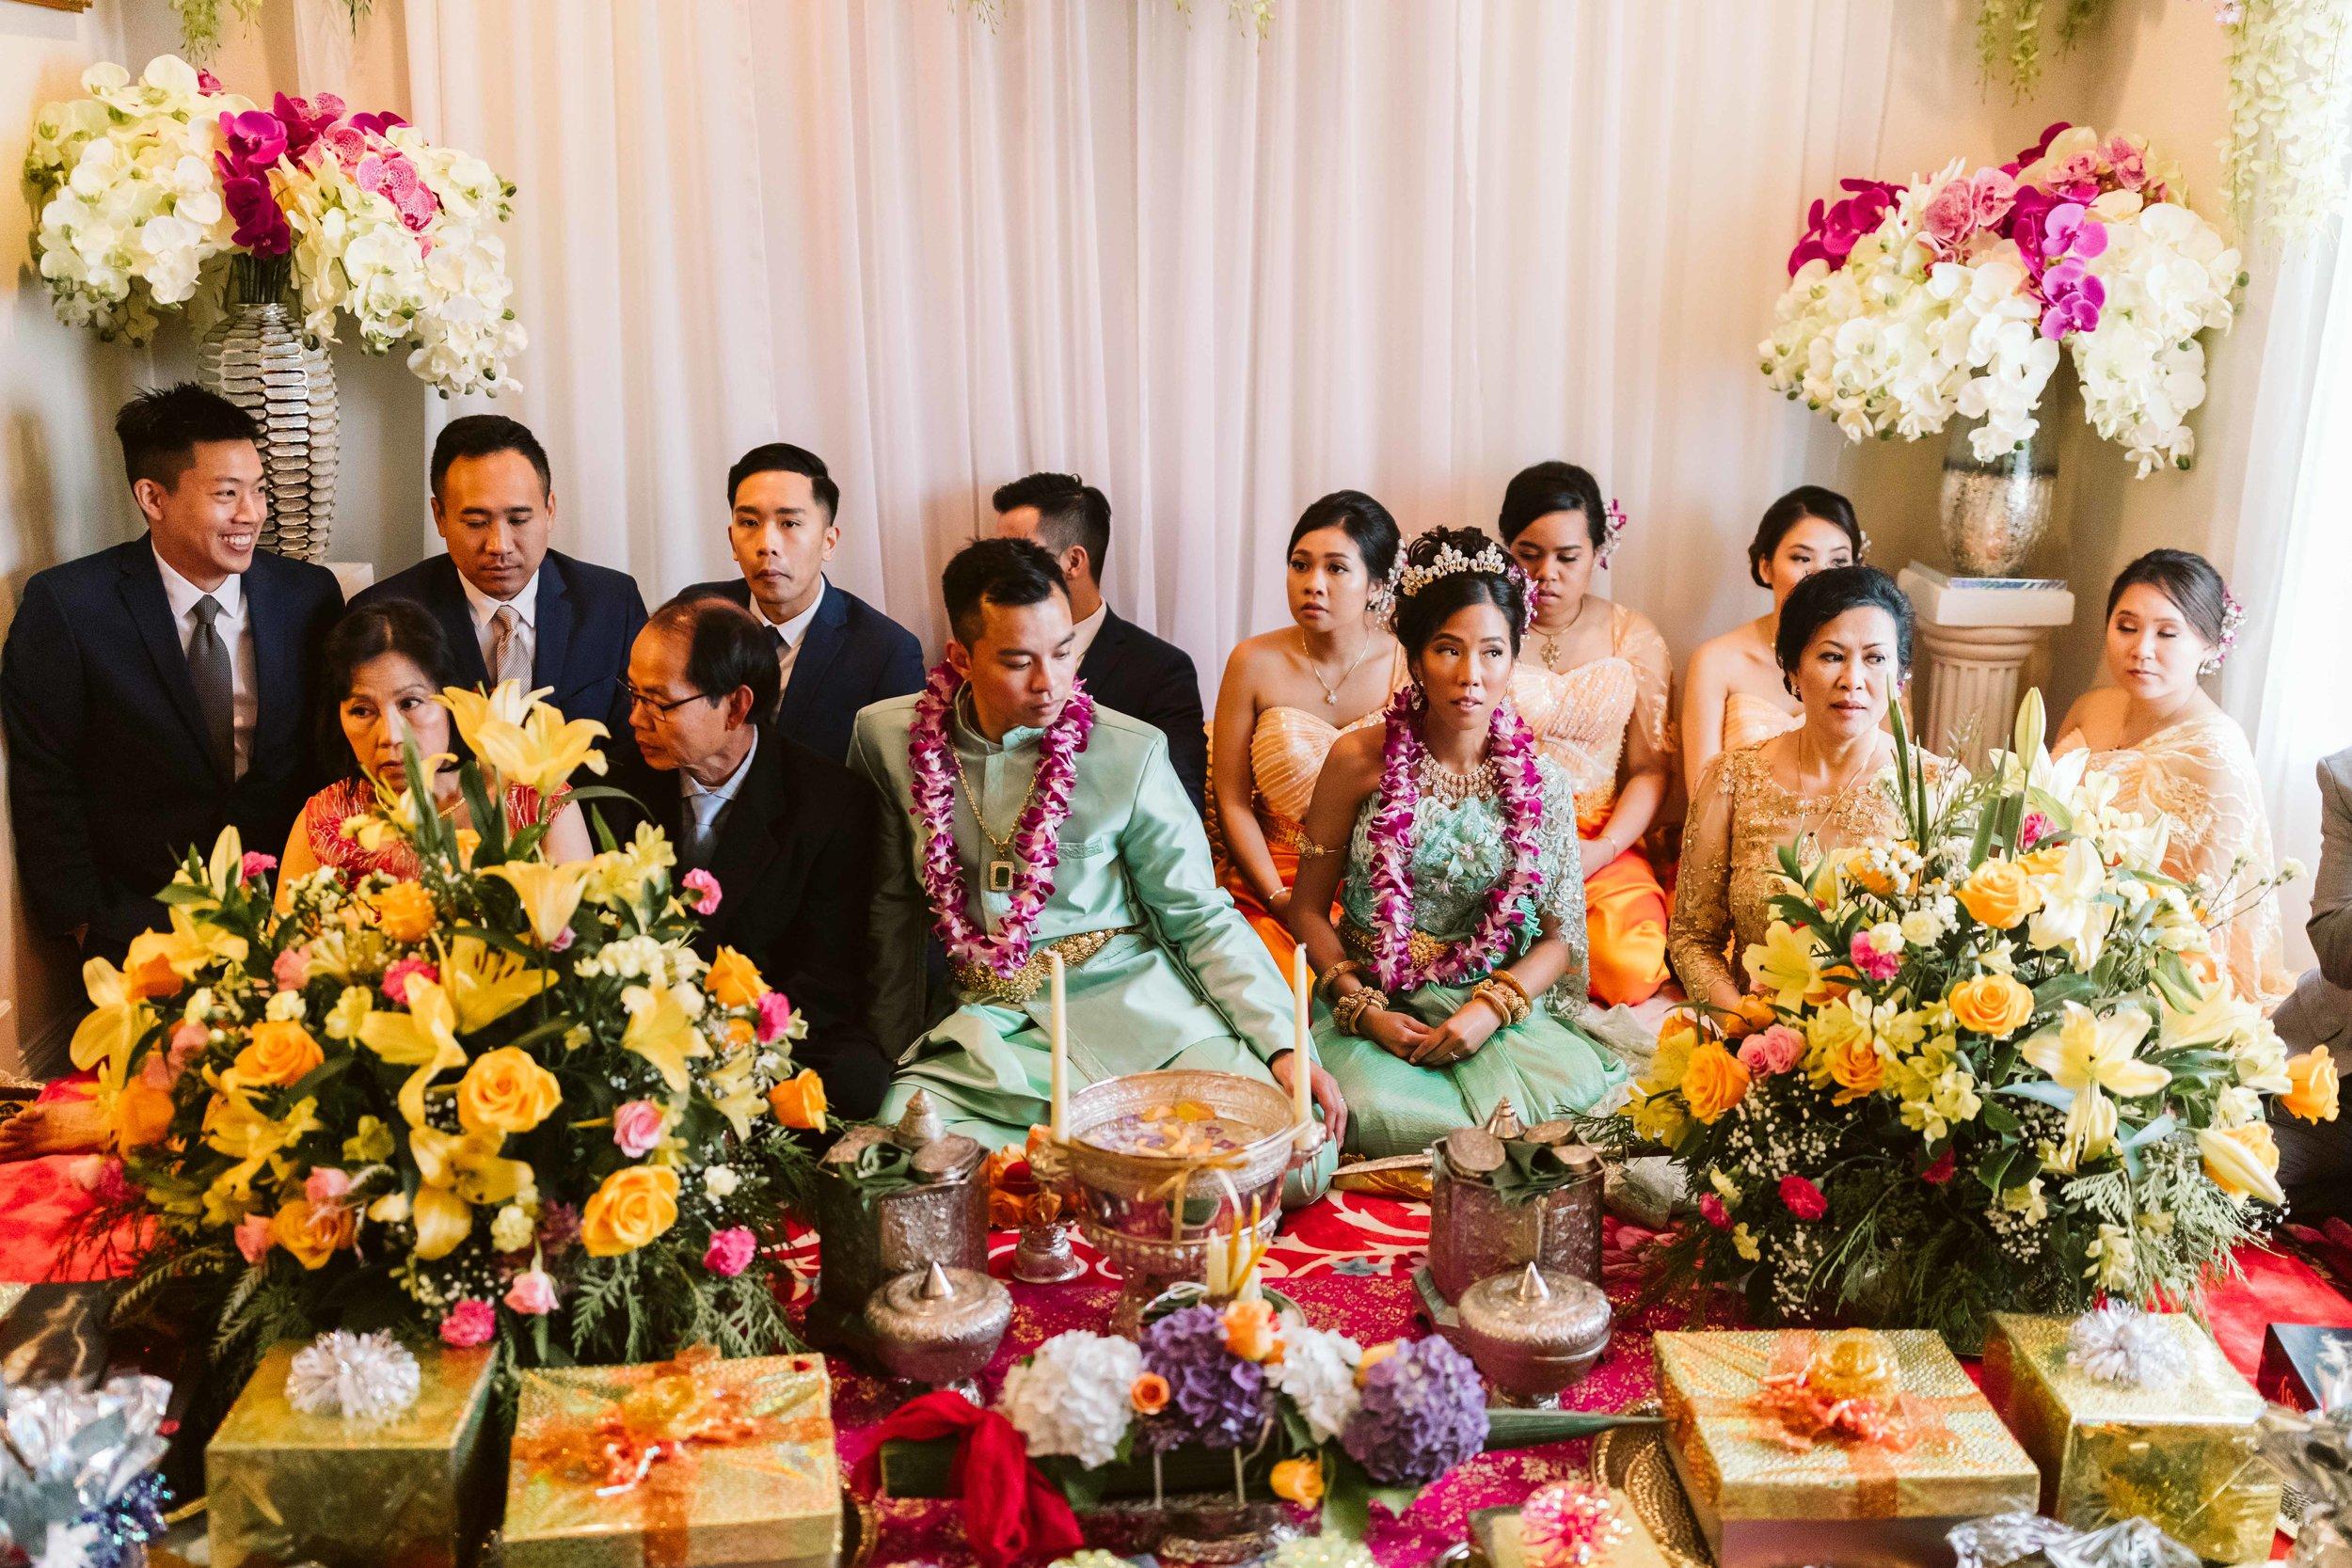 melody-ballroom-portland-wedding-21.jpg